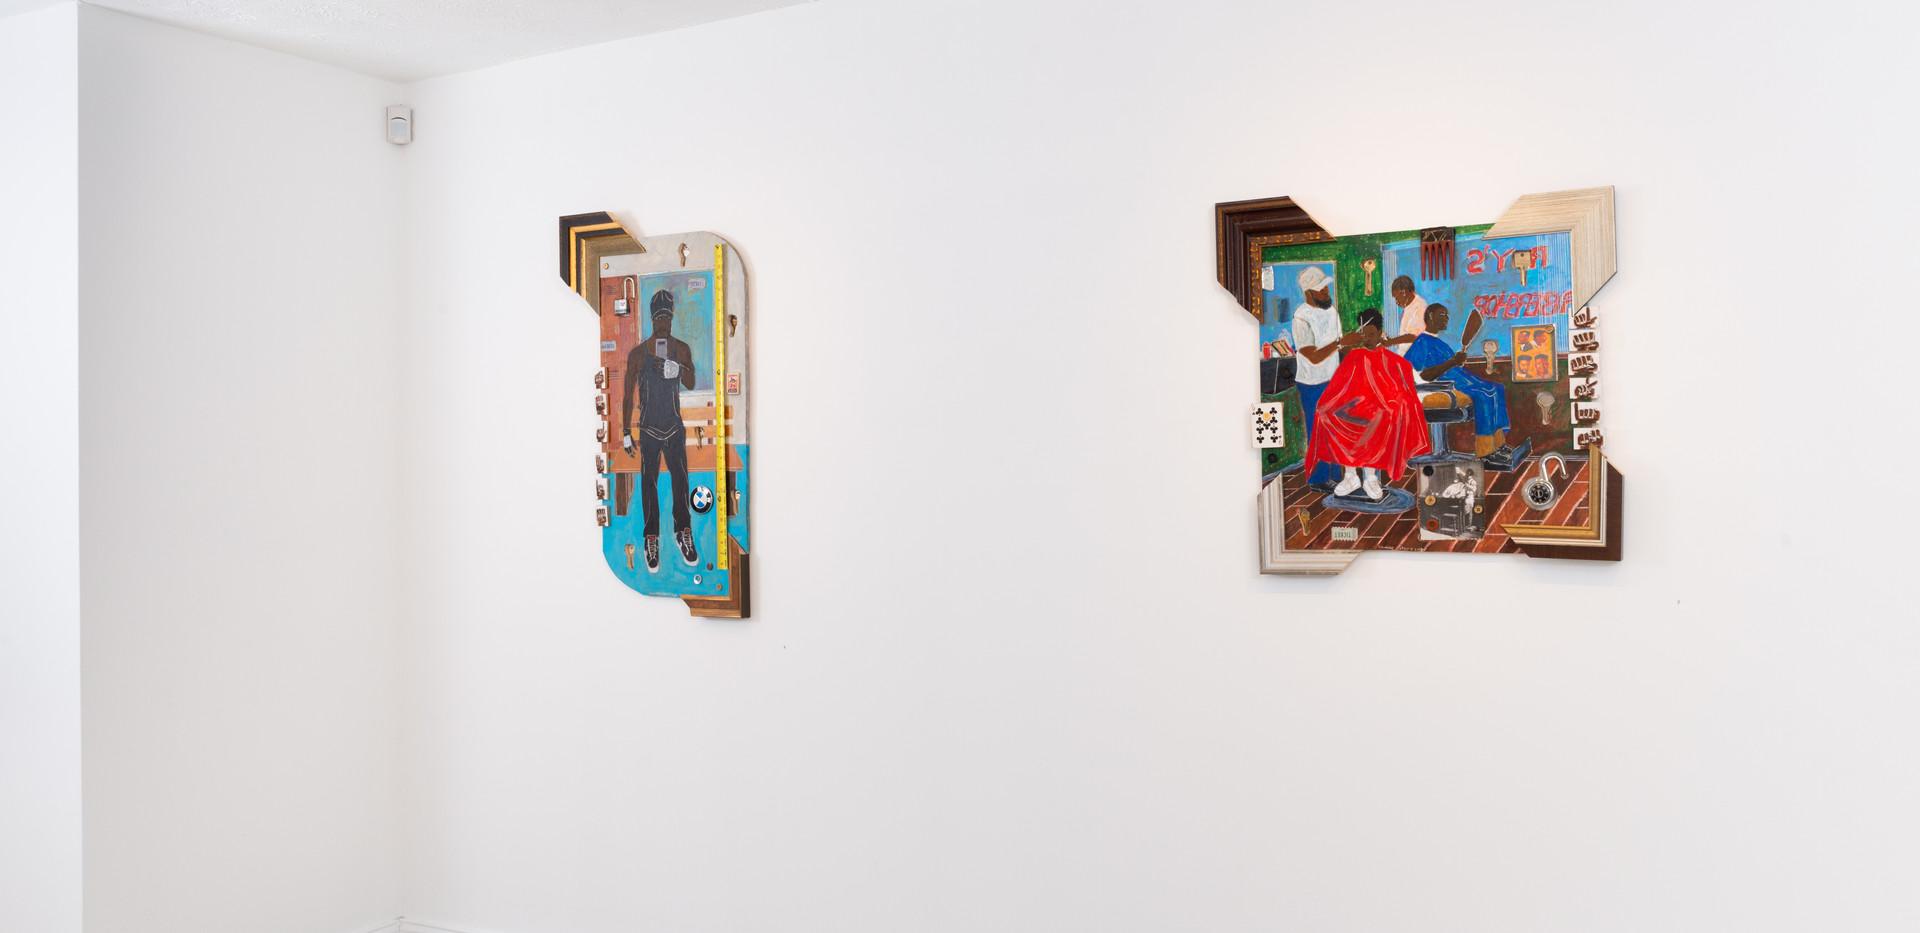 "On the left:  Schroeder Cherry  ""Selfie"" Acrylic, wood, and metal 41"" x 22"", 2019  On the right:  Schroeder Cherry  ""Barbershop Series, Lookin"" Acrylic, wood, and metal 30"" x 30"", 2019"